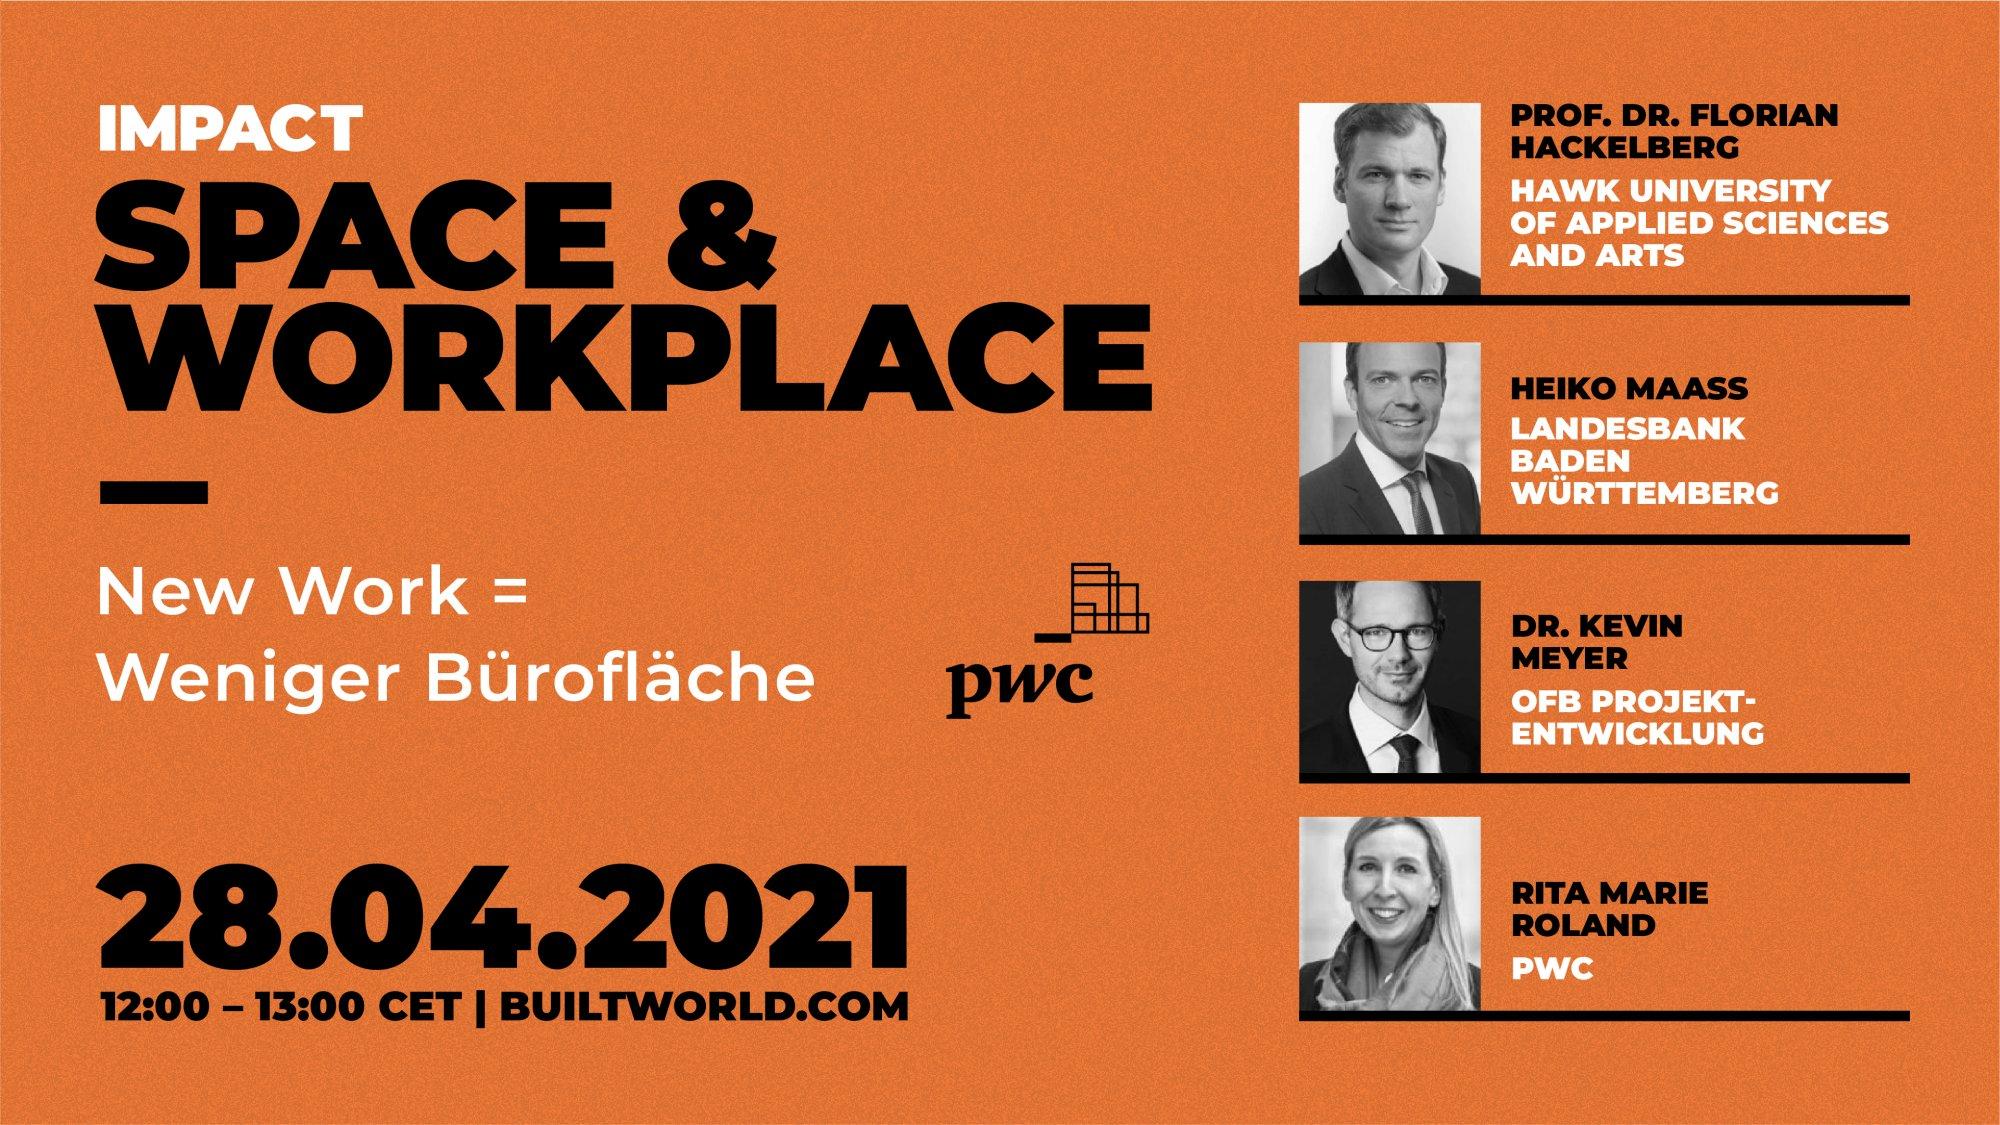 space-workplace-new-work-weniger-bueroflaeche